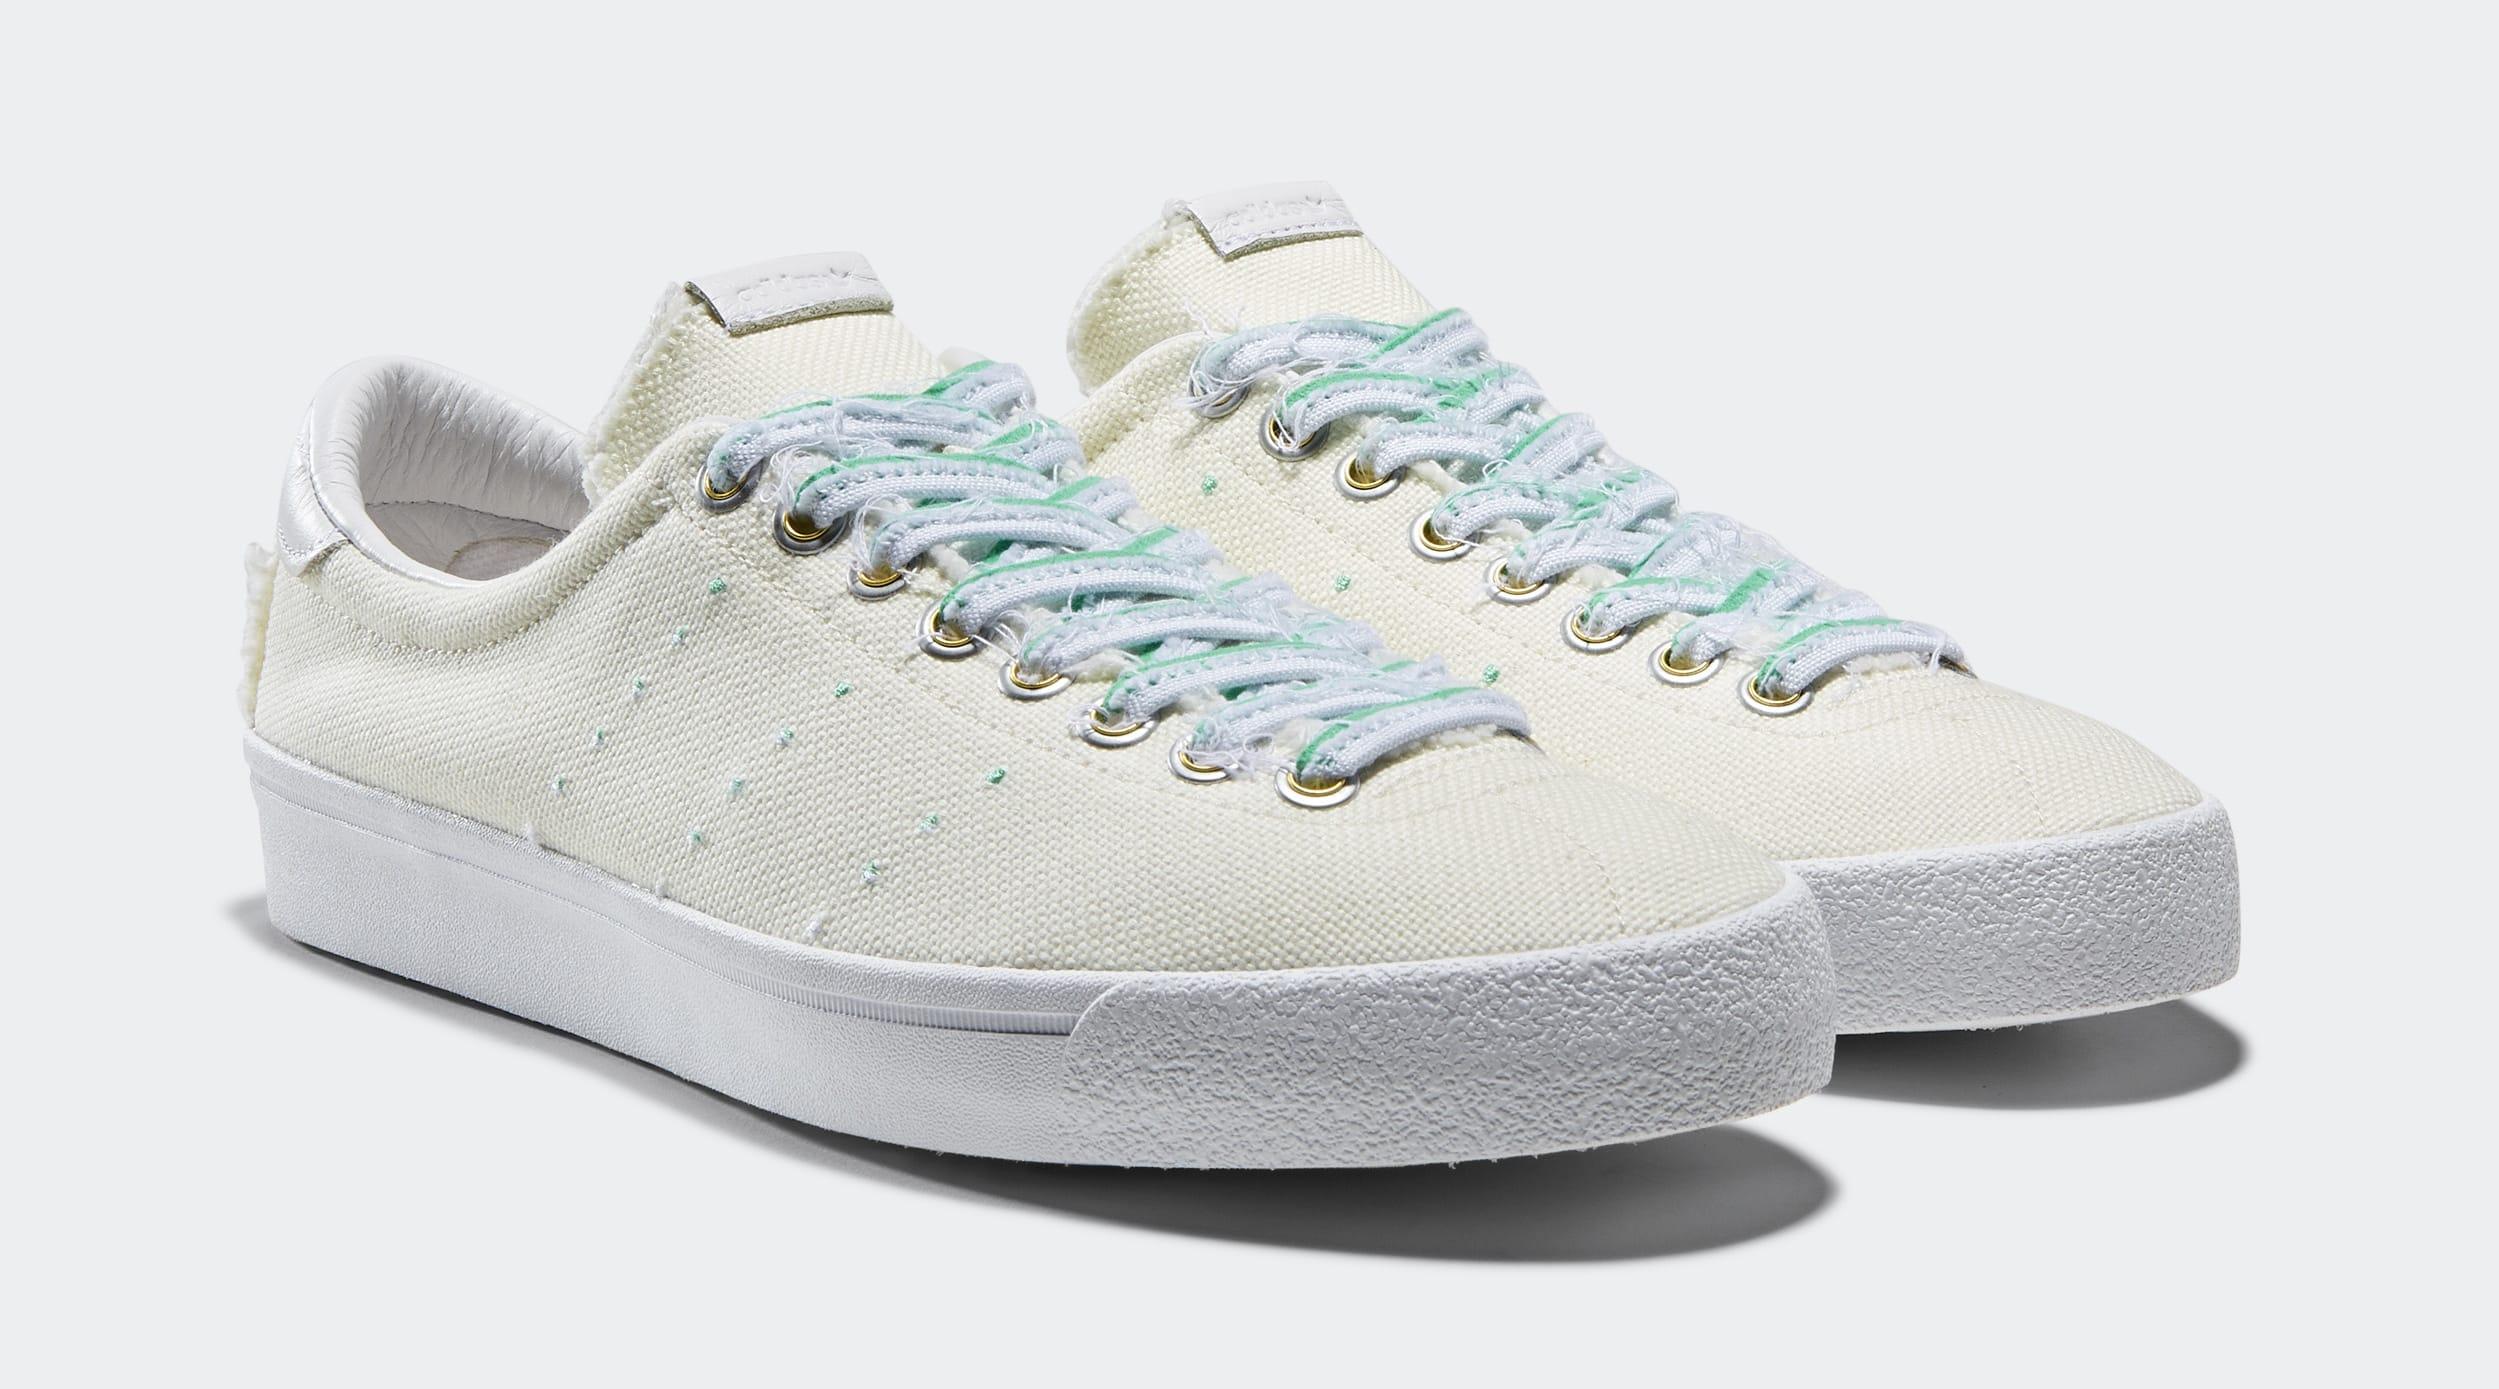 Donald Glover x Adidas Lacombe EF2667 (Pair)